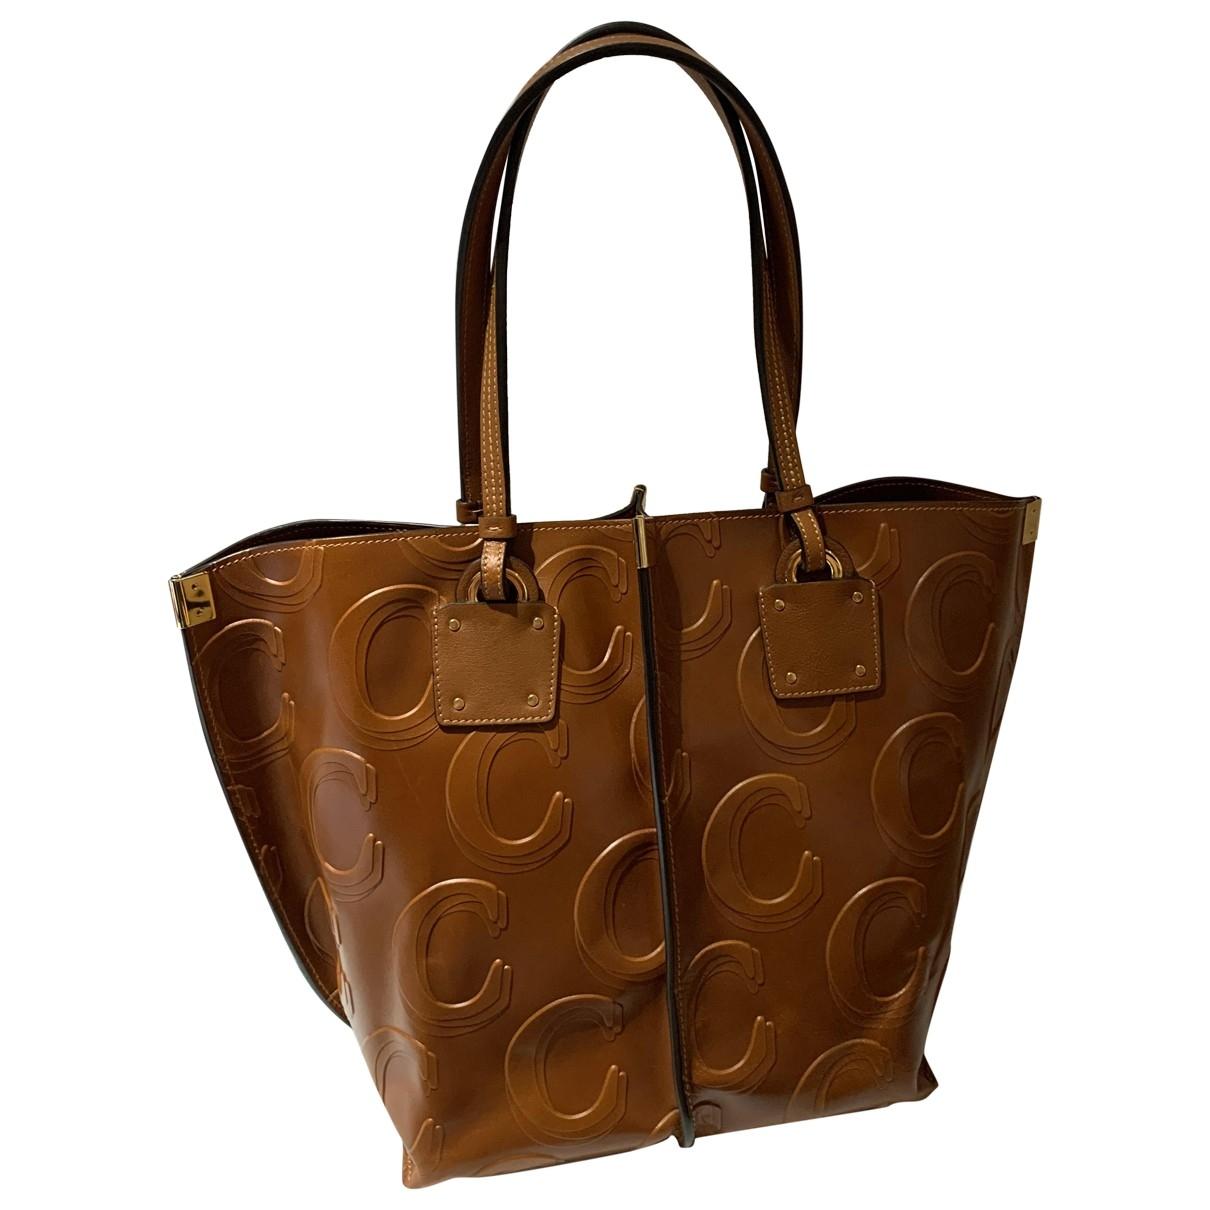 Chloé \N Camel Leather handbag for Women \N